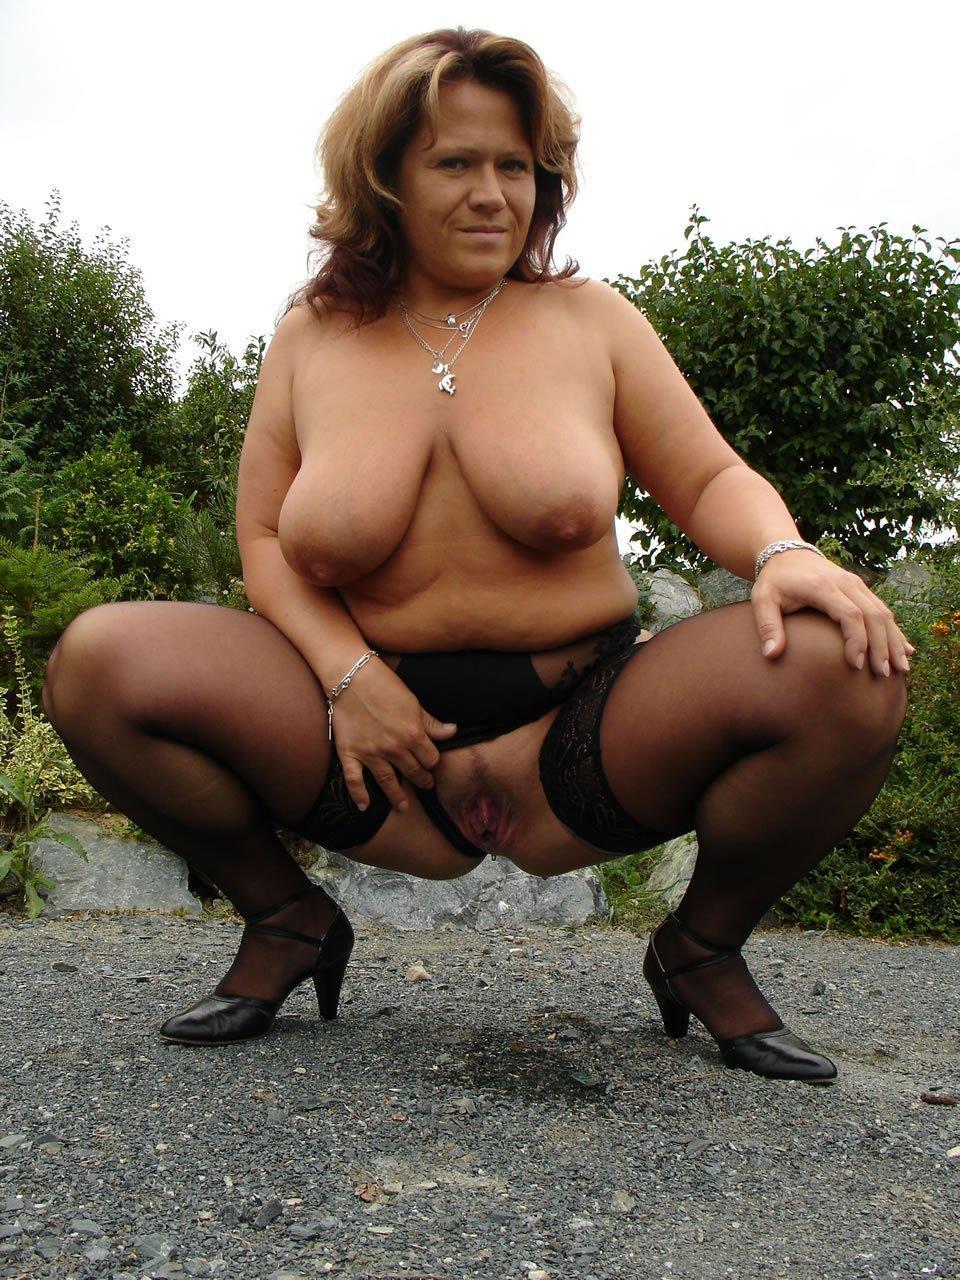 Nude chubby amature granny